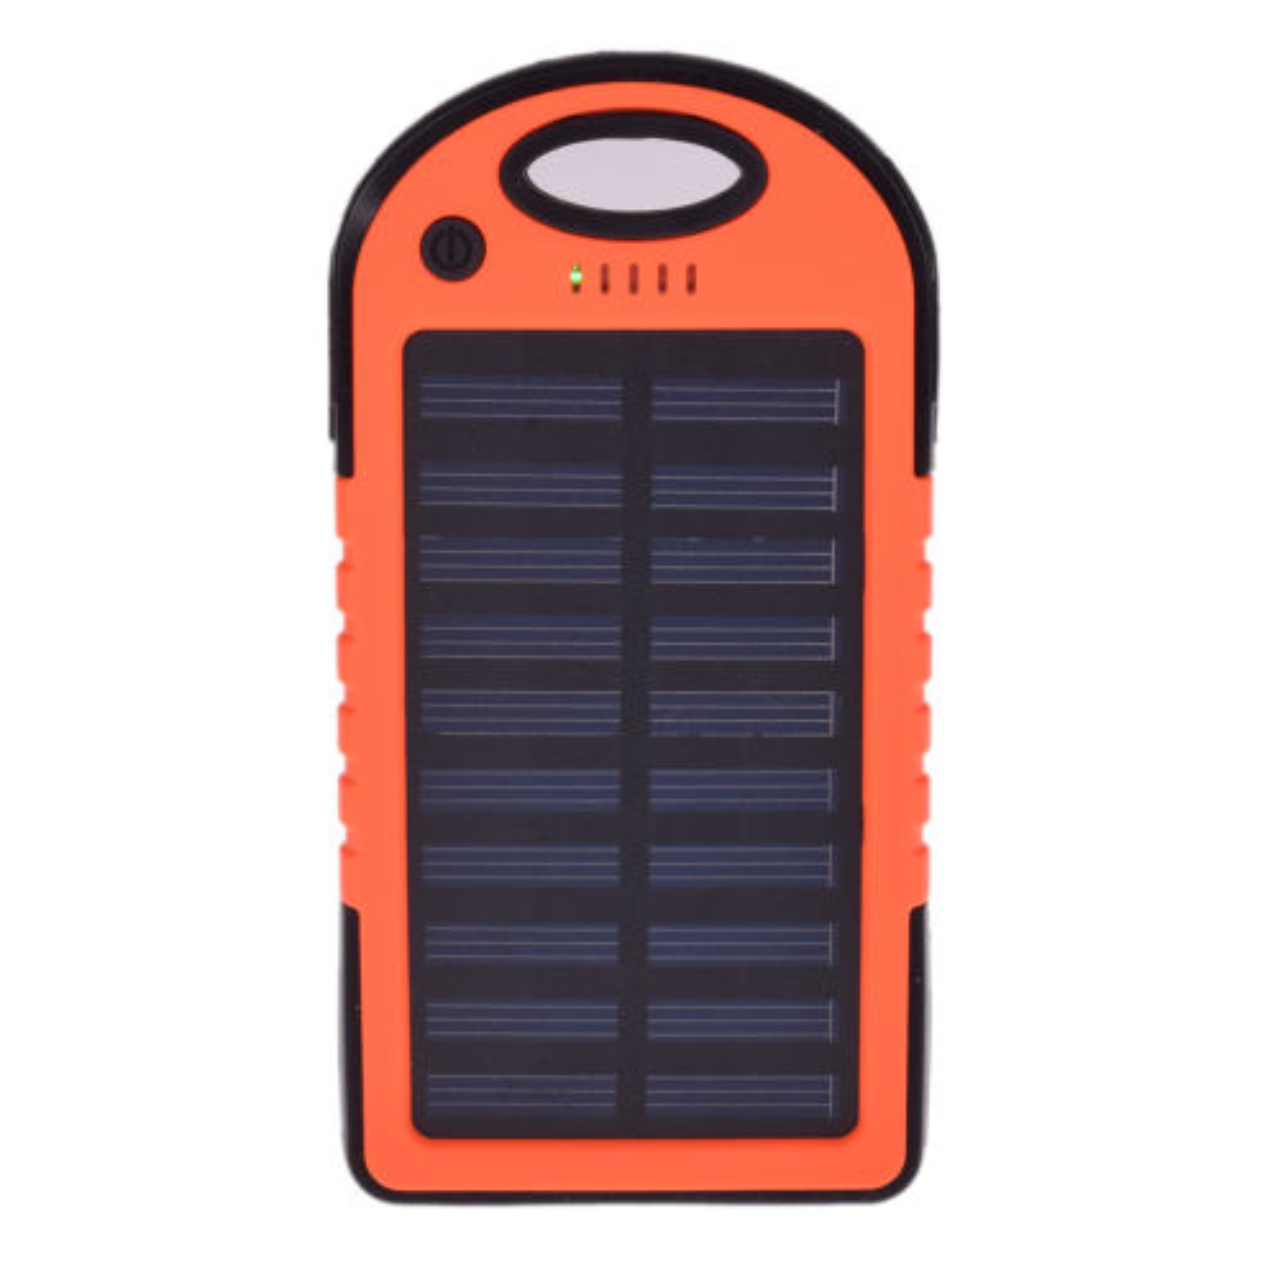 شارژر همراه خورشیدی تسلا مدل T8s ظرفیت 8000 میلی آمپر ساعت